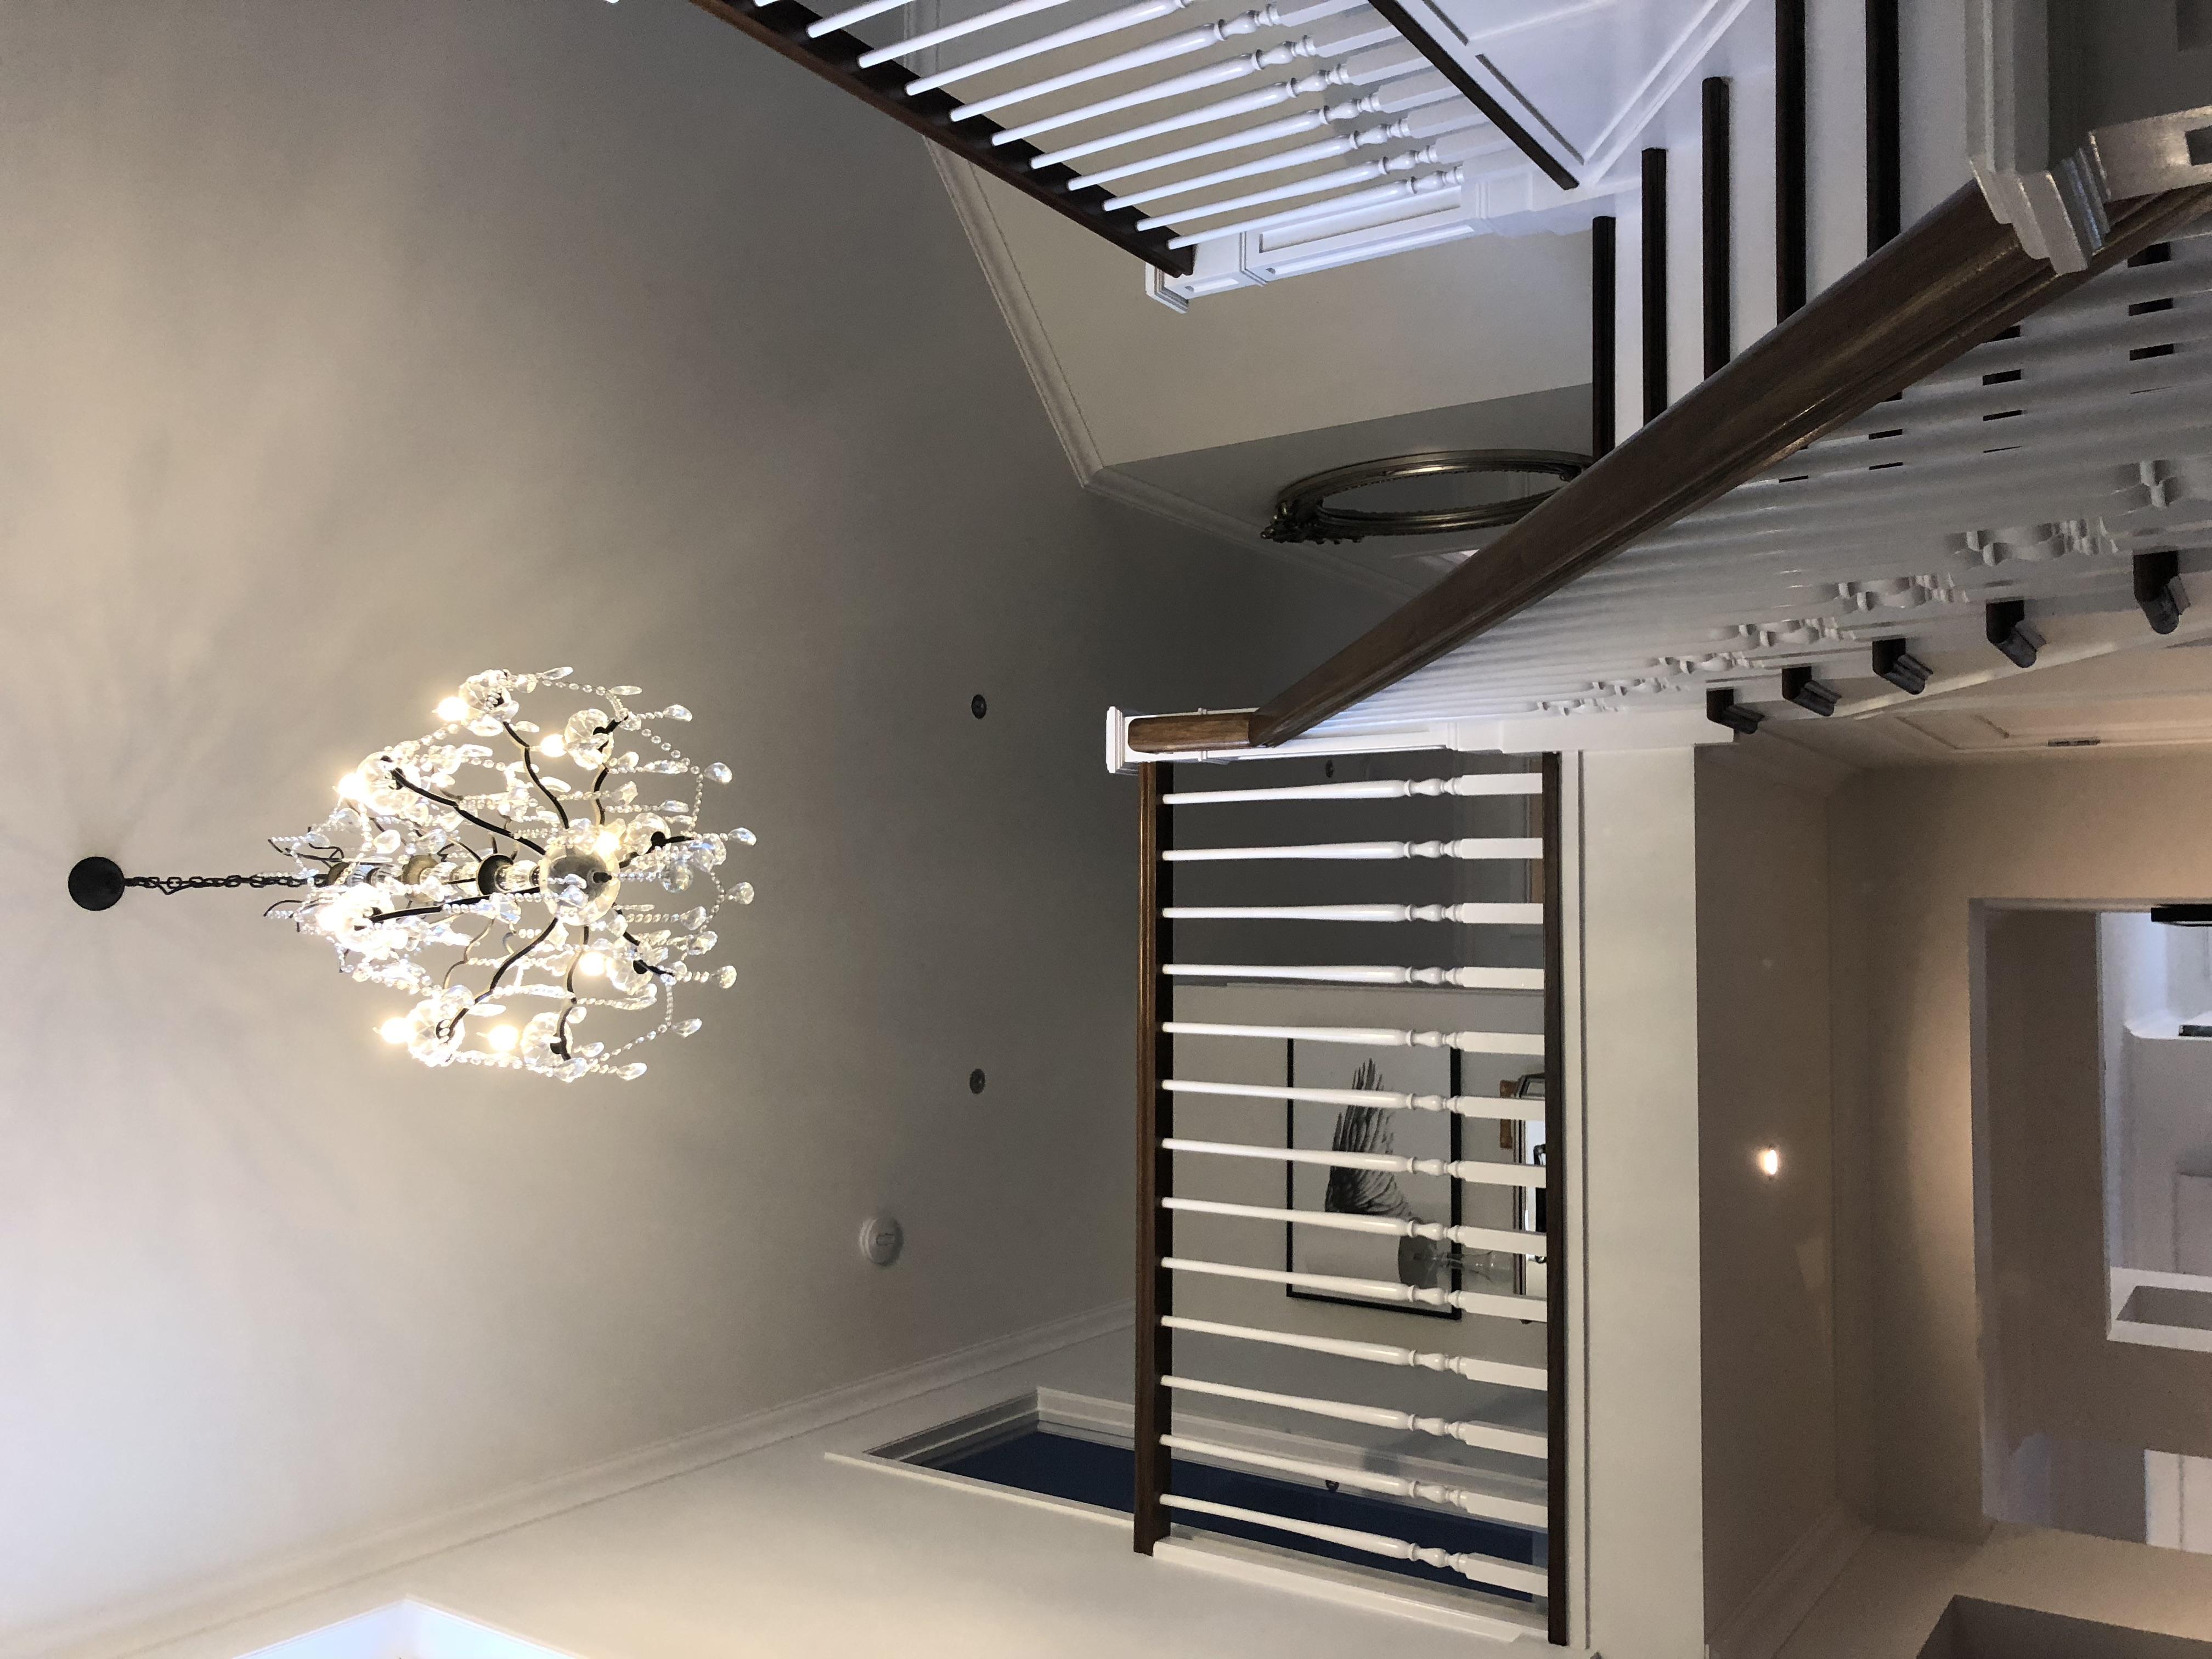 Electrician Staircase Pendant